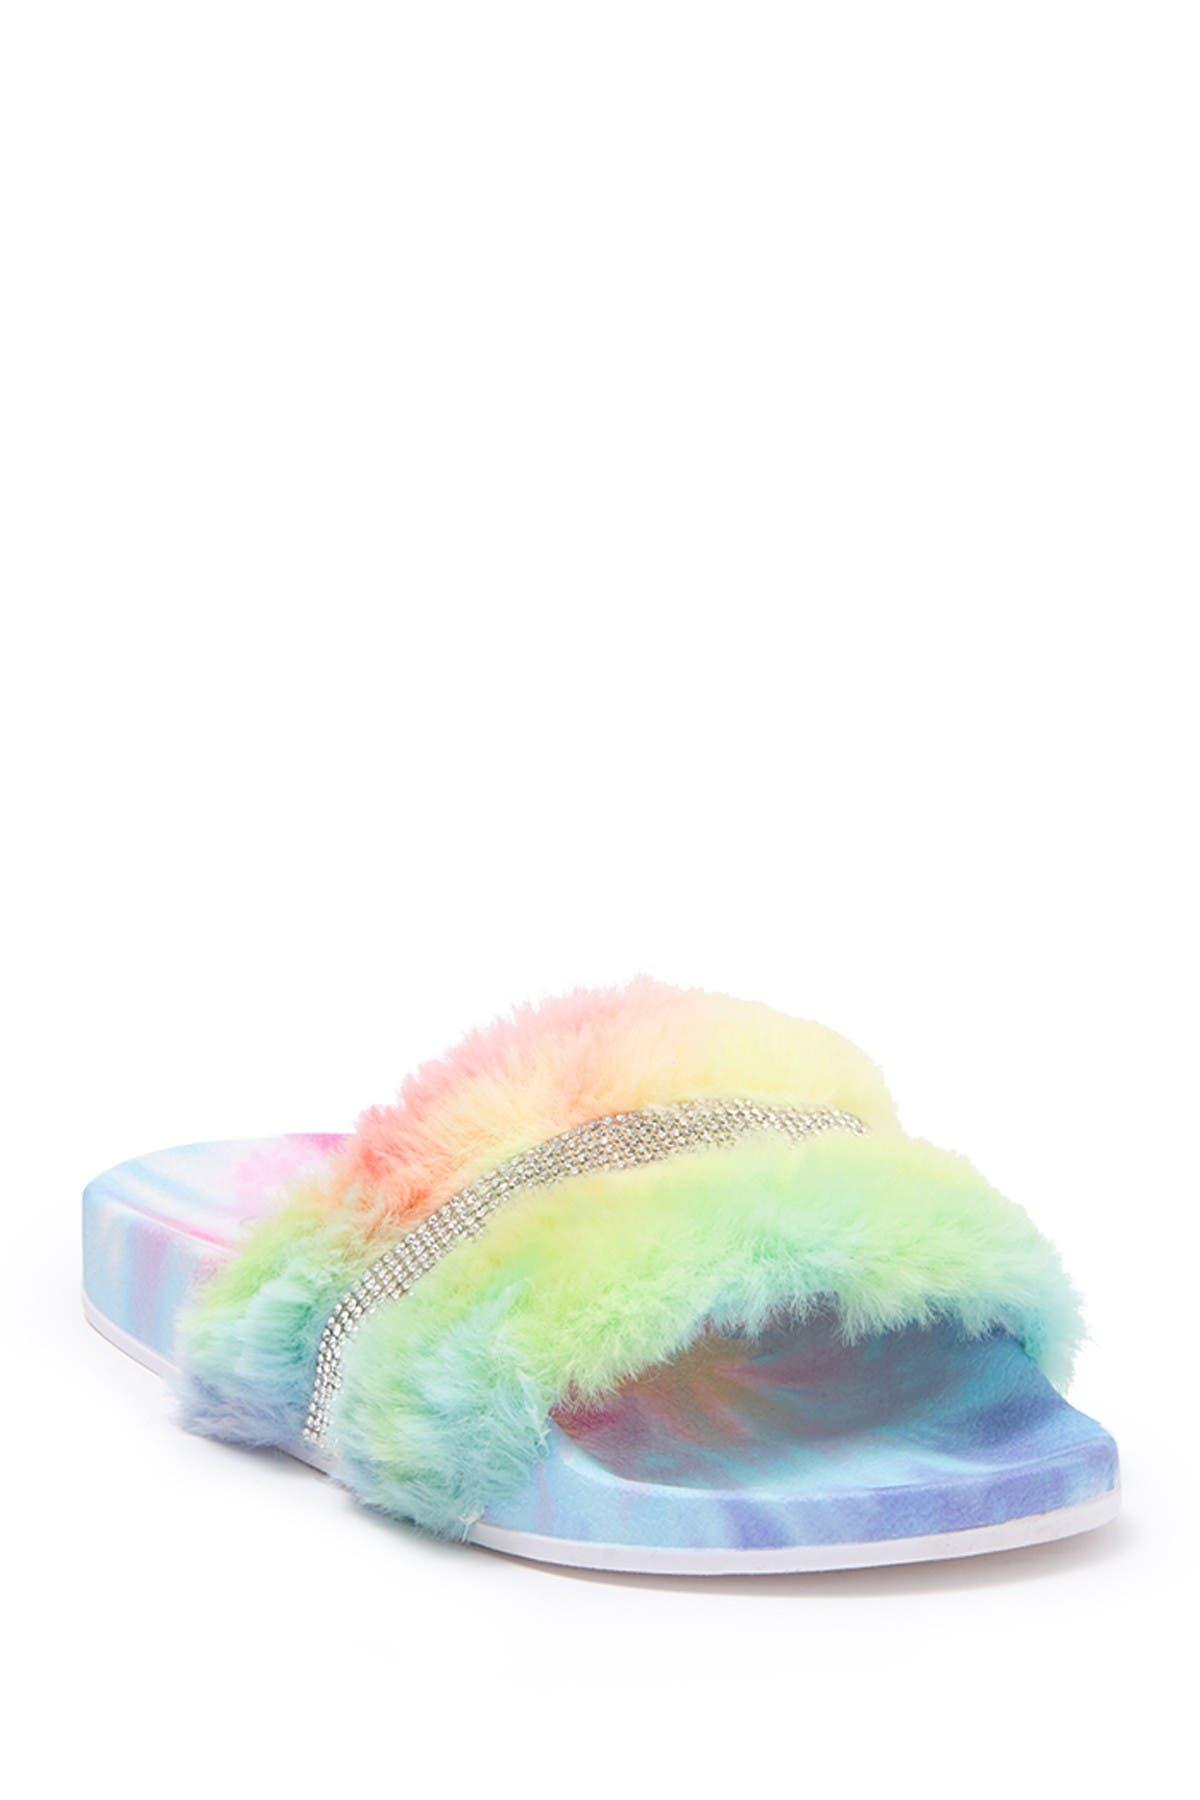 Image of Top Moda Rhinestone Faux Fur Slide